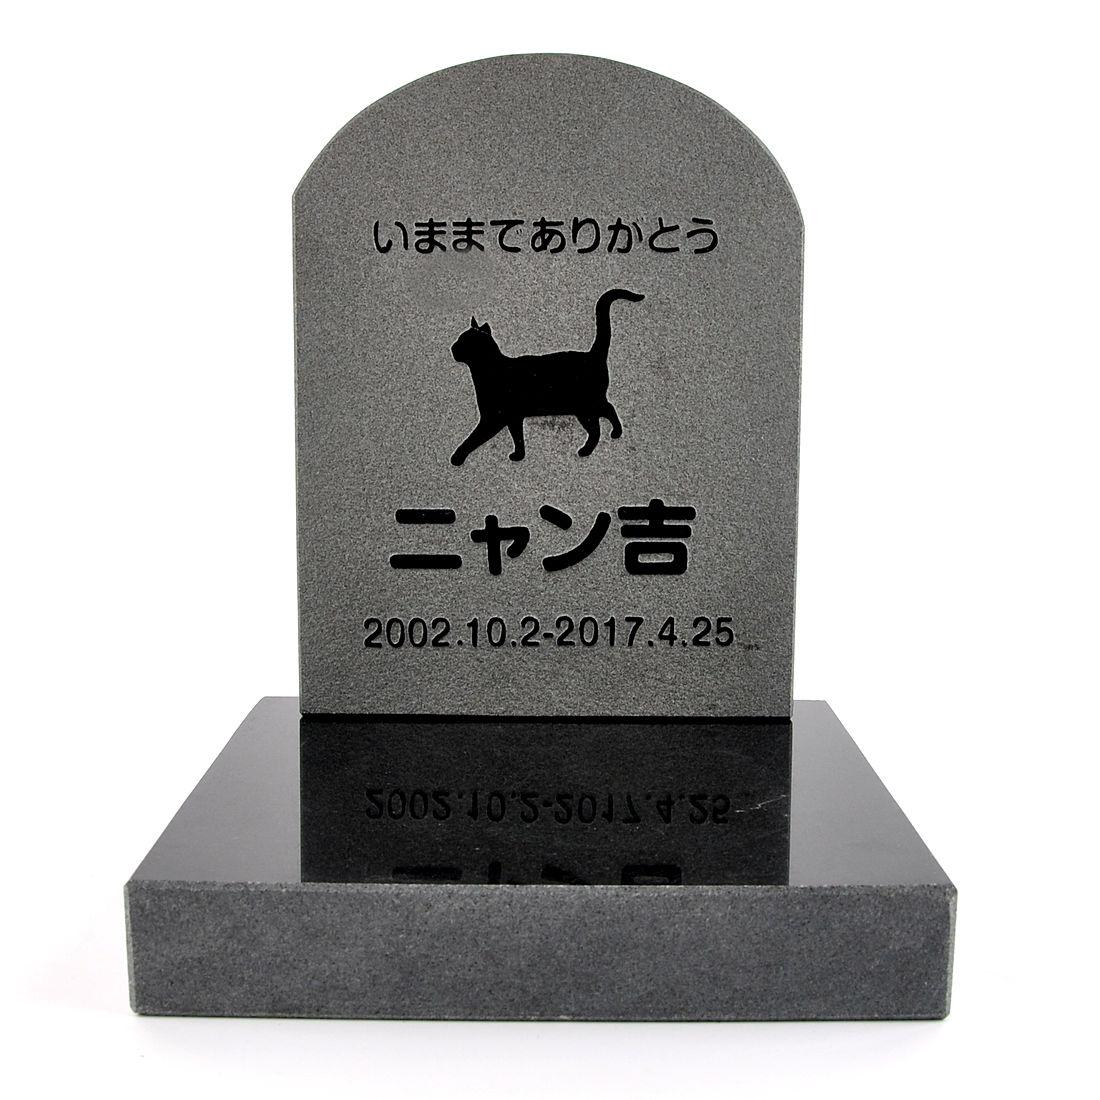 Pet&Love. ペットのお墓 天然石製 セット型 底板が厚く重いタイプ 御影石 ブラック 浮き彫り スタンダード  【HLS_DU】【楽ギフ_名入れ】 attr177attr ctgr2ctgr sml3sml+ctgr2ctgr CAT